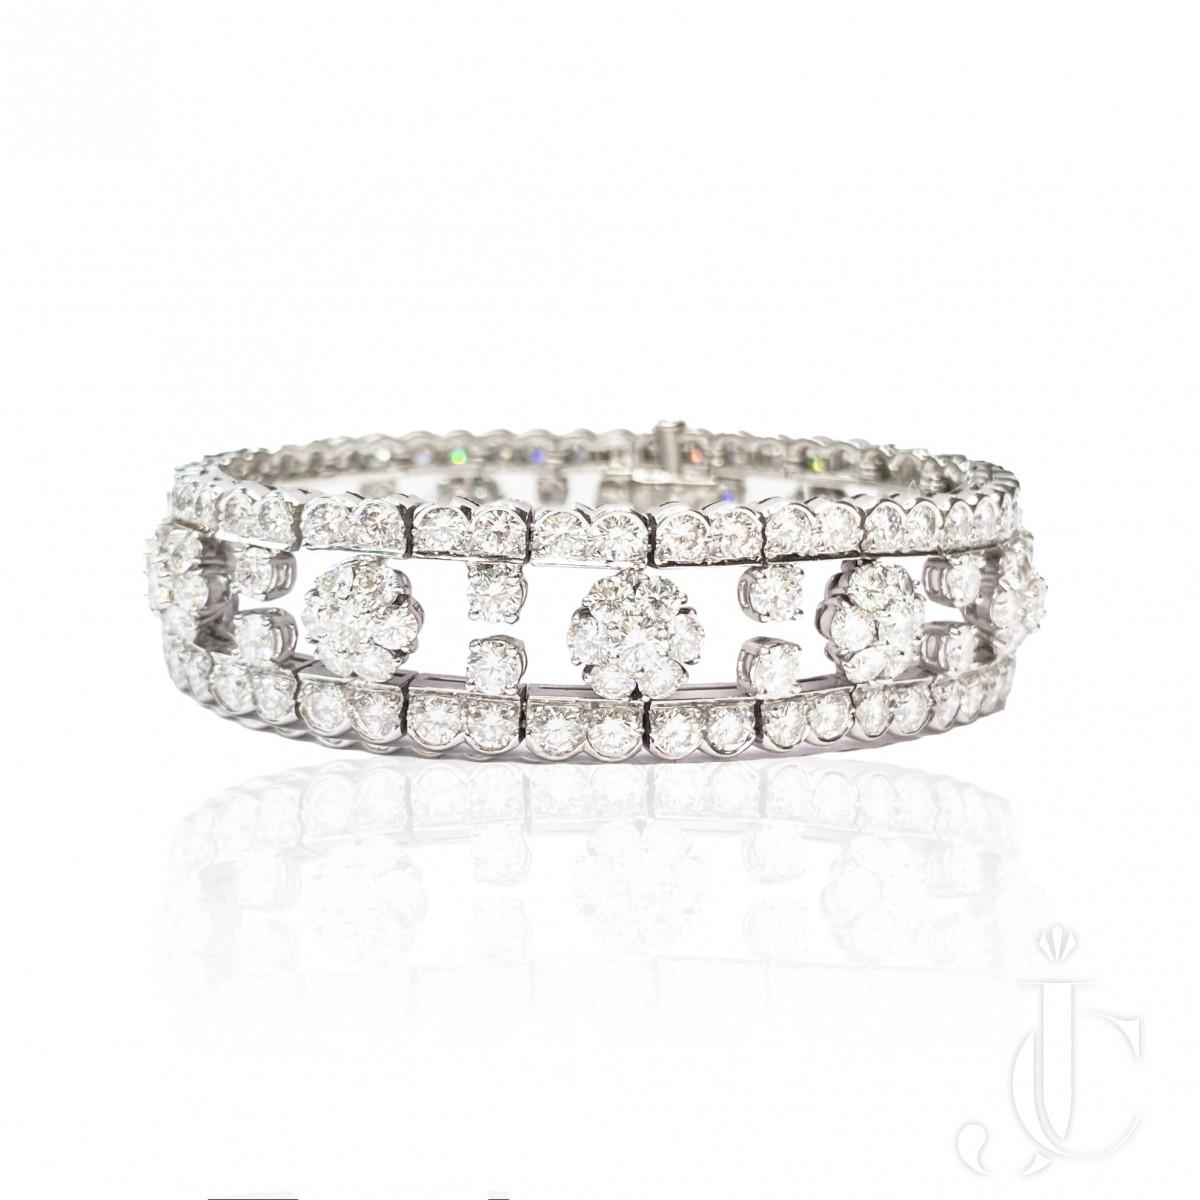 Van Cleef & Arpels Platinum and Diamond Snowflake Bracelet